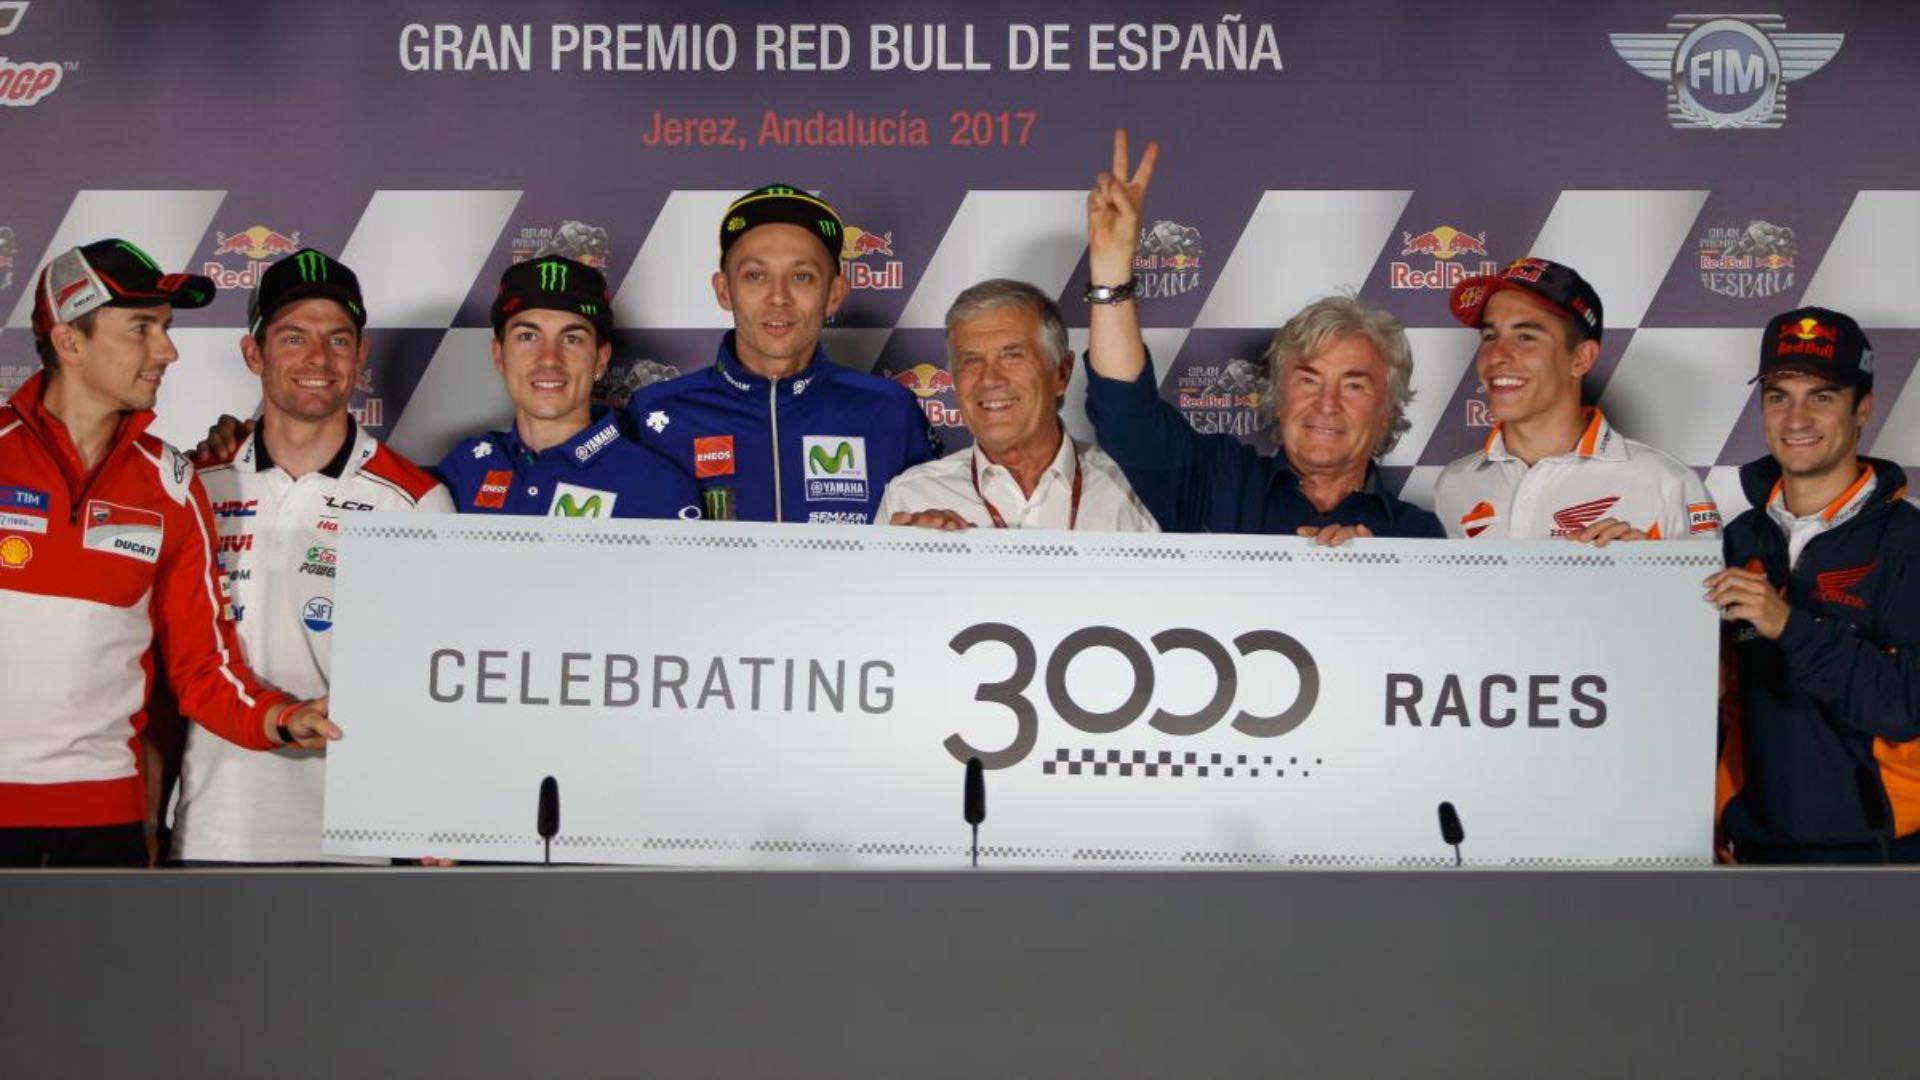 2017 Jerez MotoGP Celebrates 3,000th Grand Prix Anniversary